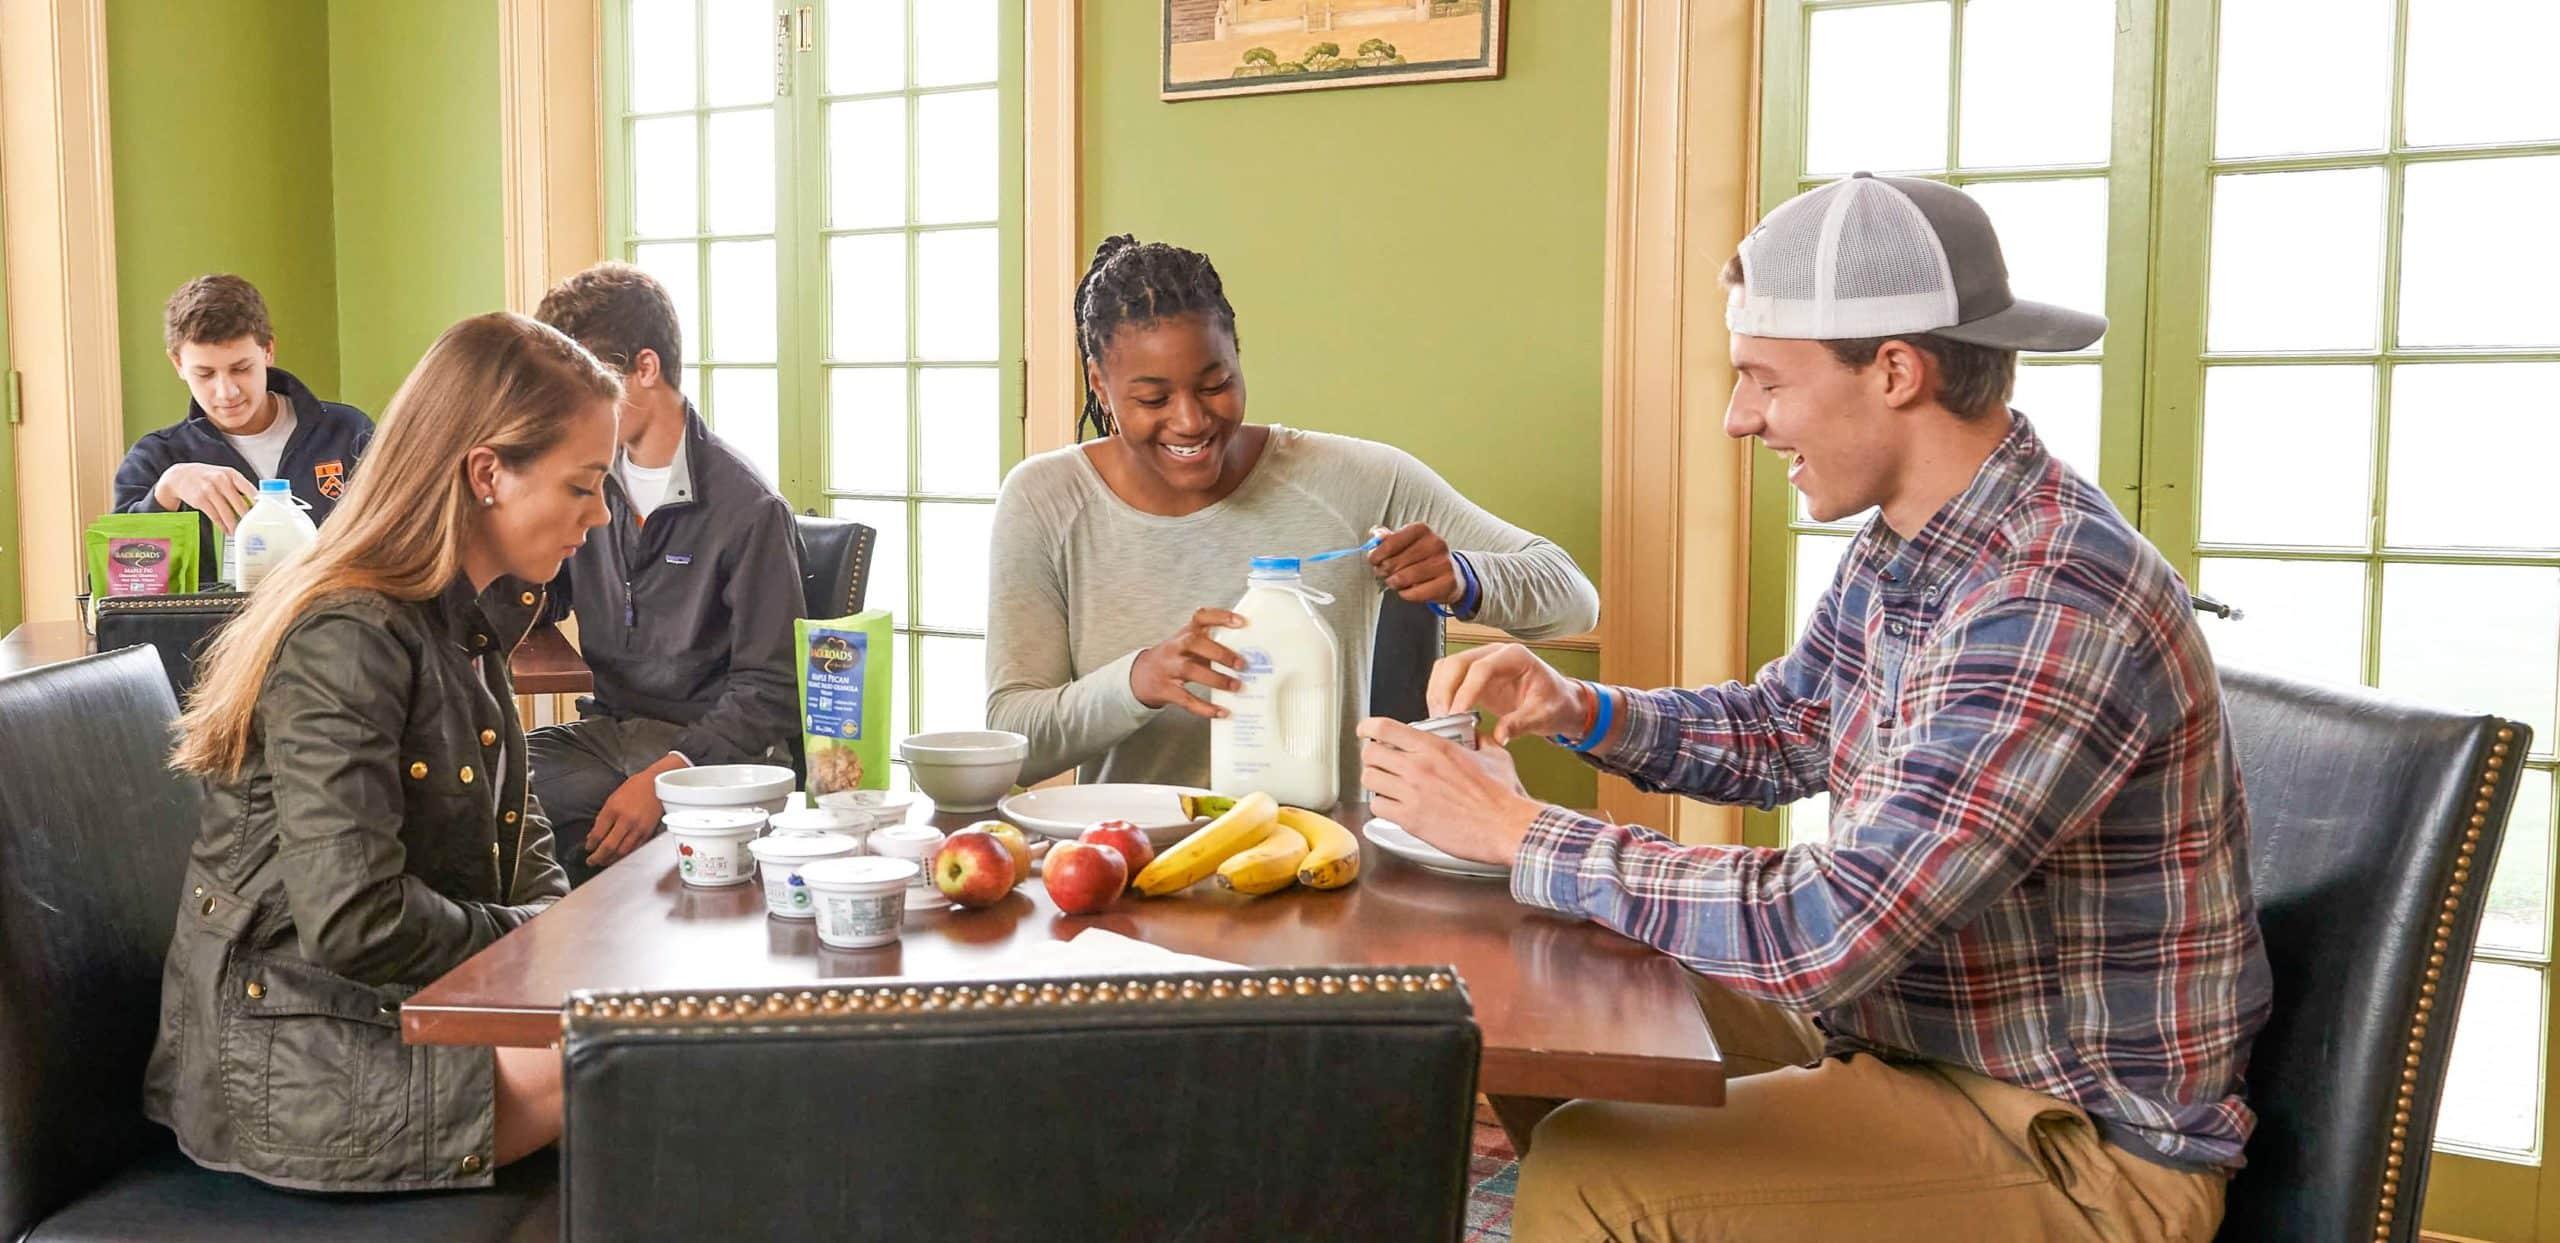 Three students eating breakfast